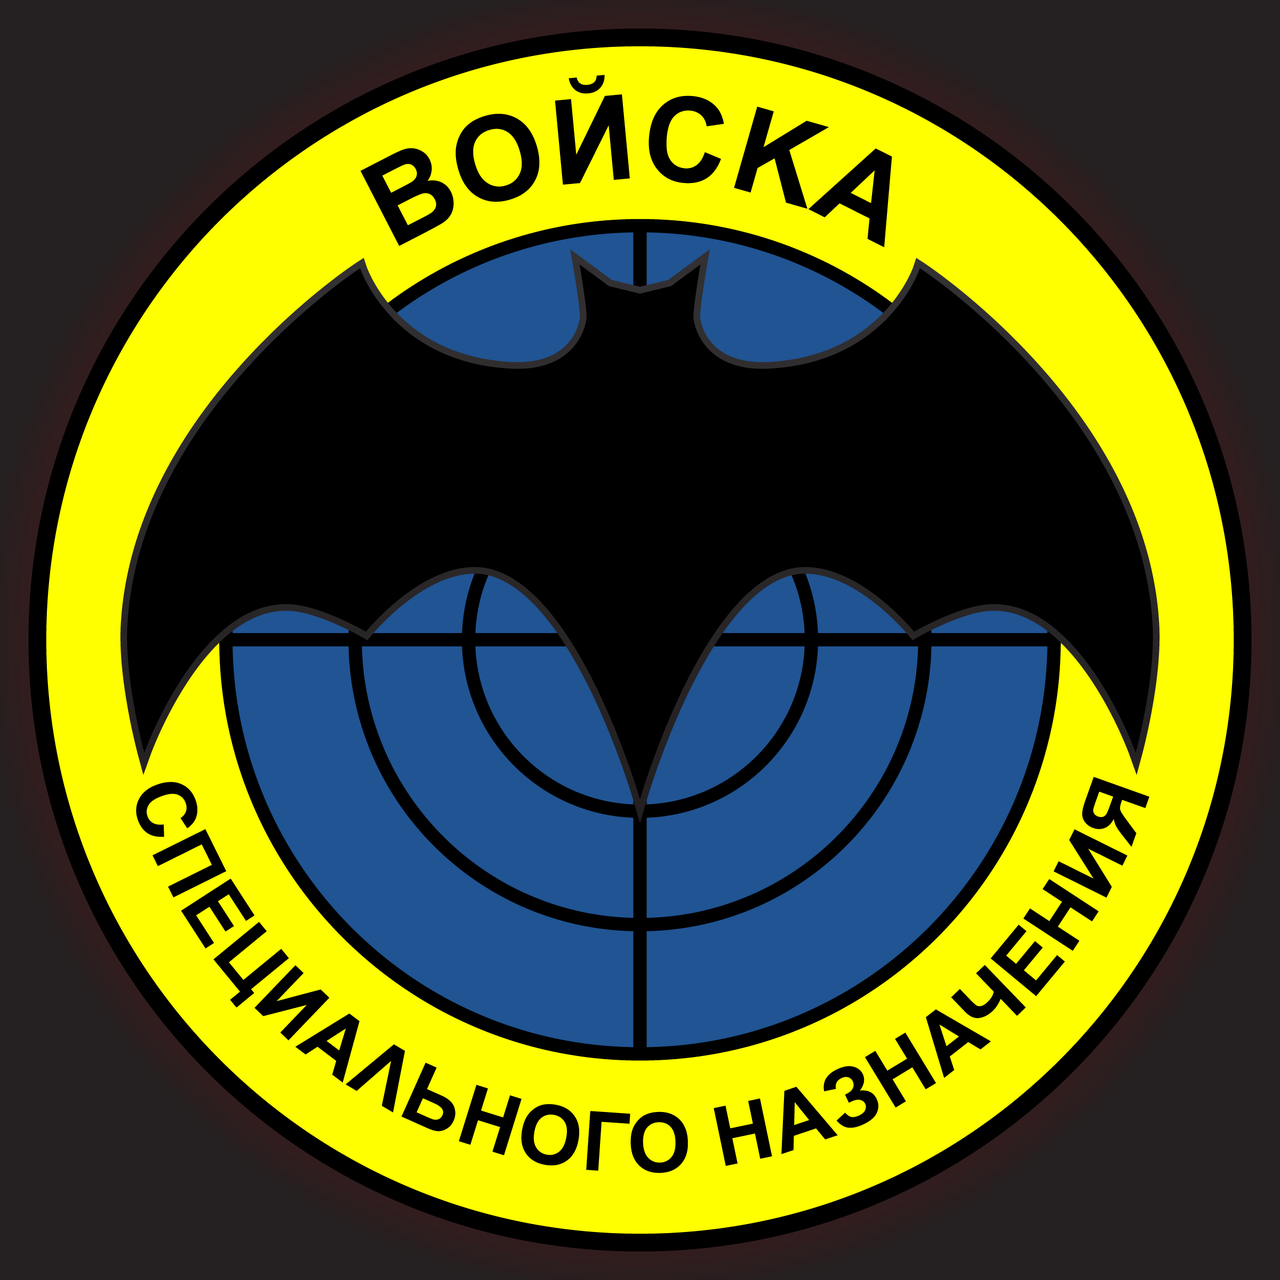 Official Spetsnaz Logo Spetsnaz - Pasu...